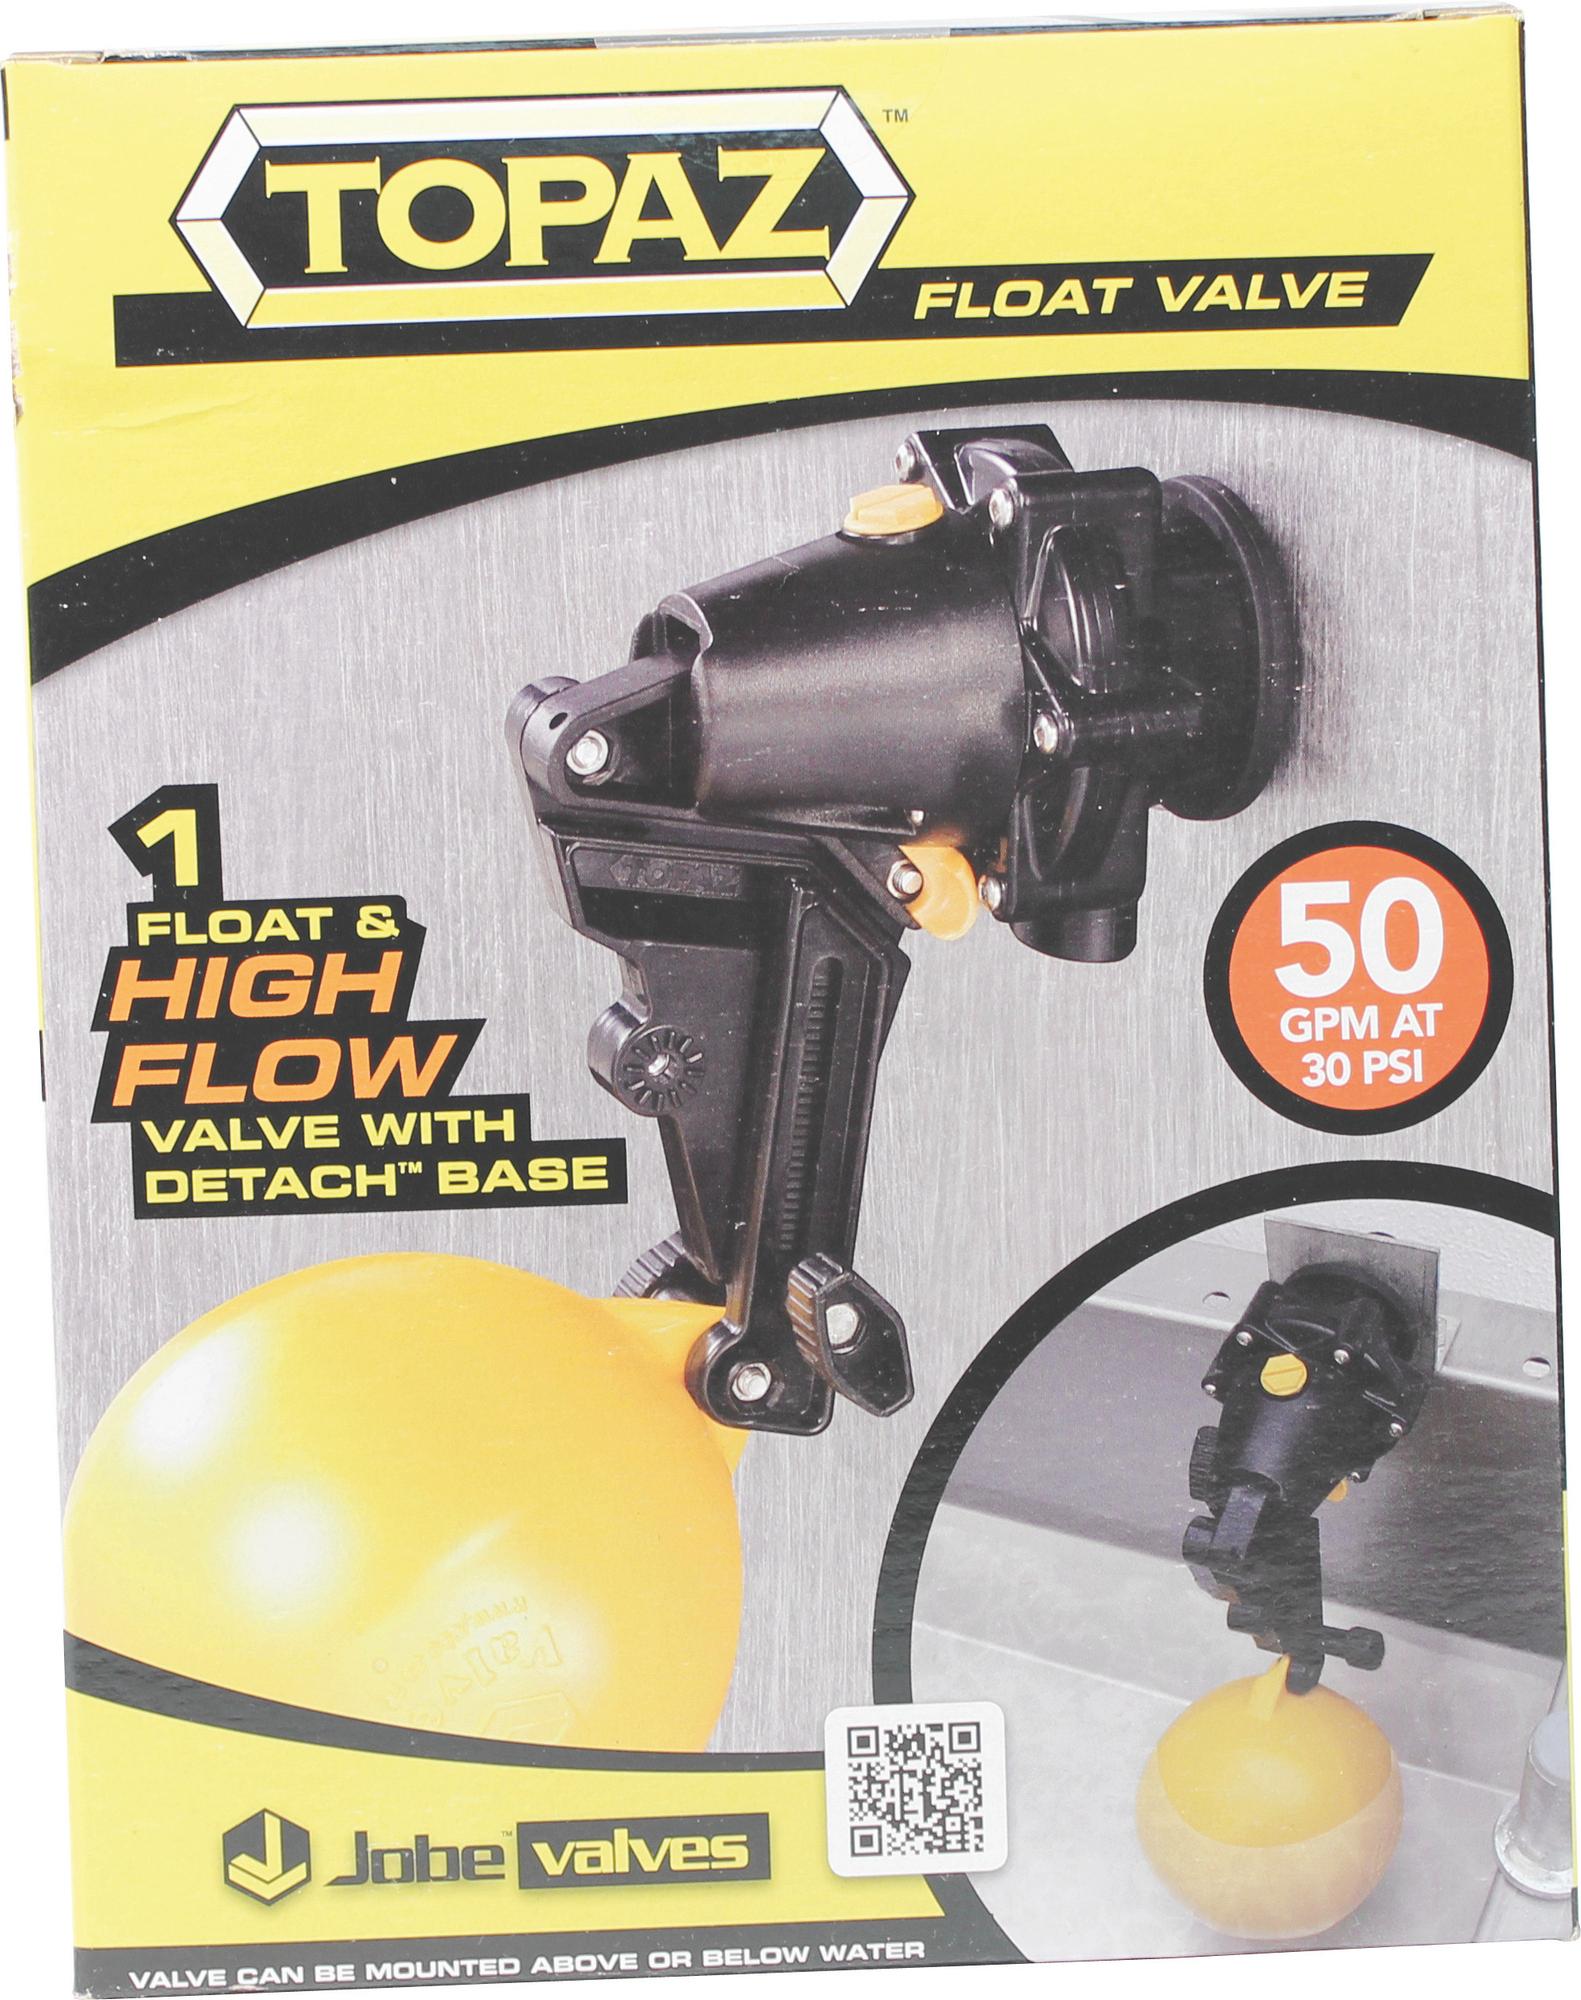 Topaz Trough 1 Valve With Float